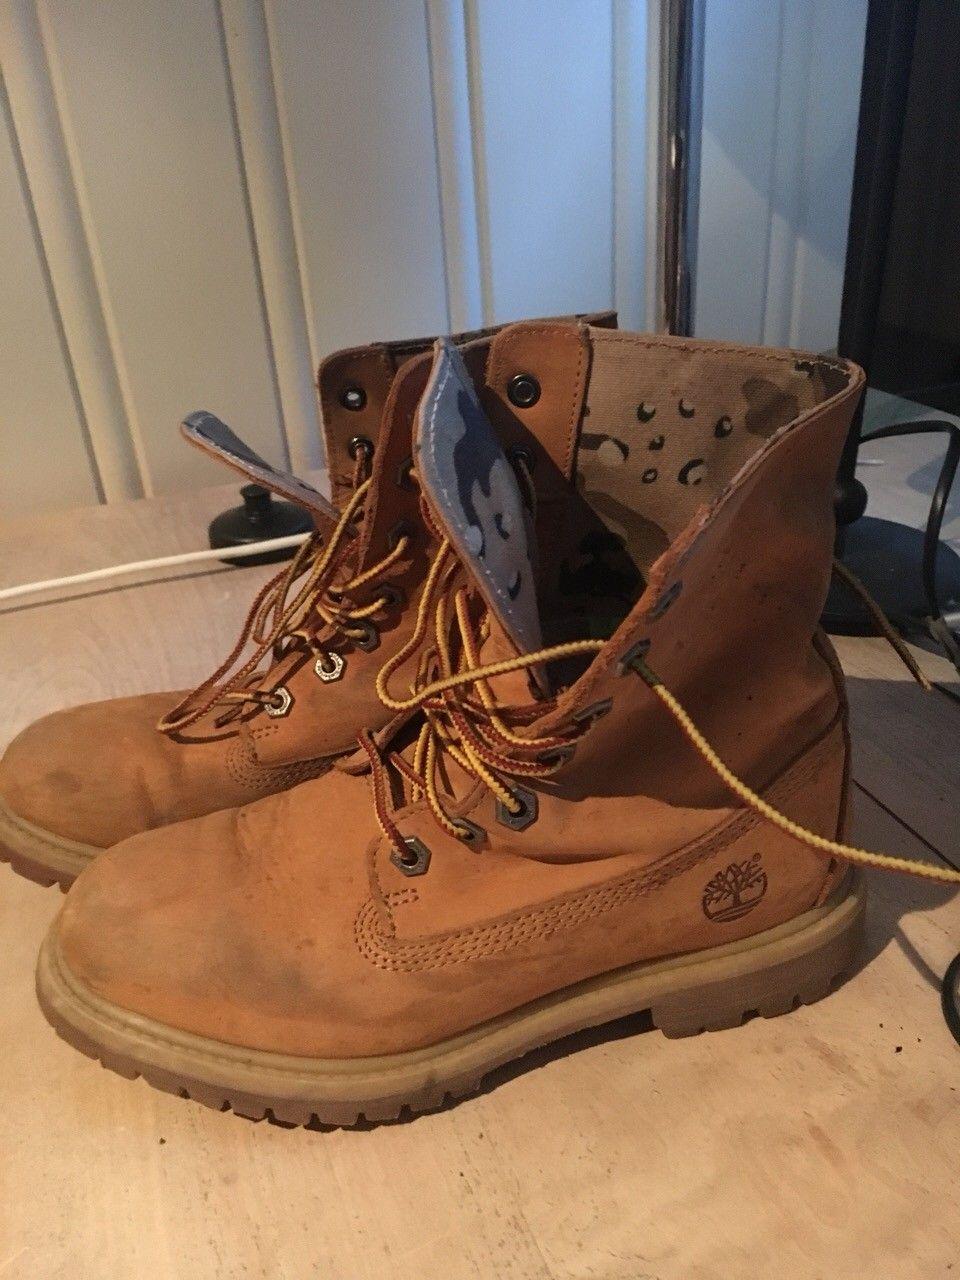 Timberland-boots str 37 - Oslo  - Timberland boots. Lite brukt. Camo-mønster inni. Nypris 1800 kr - Oslo